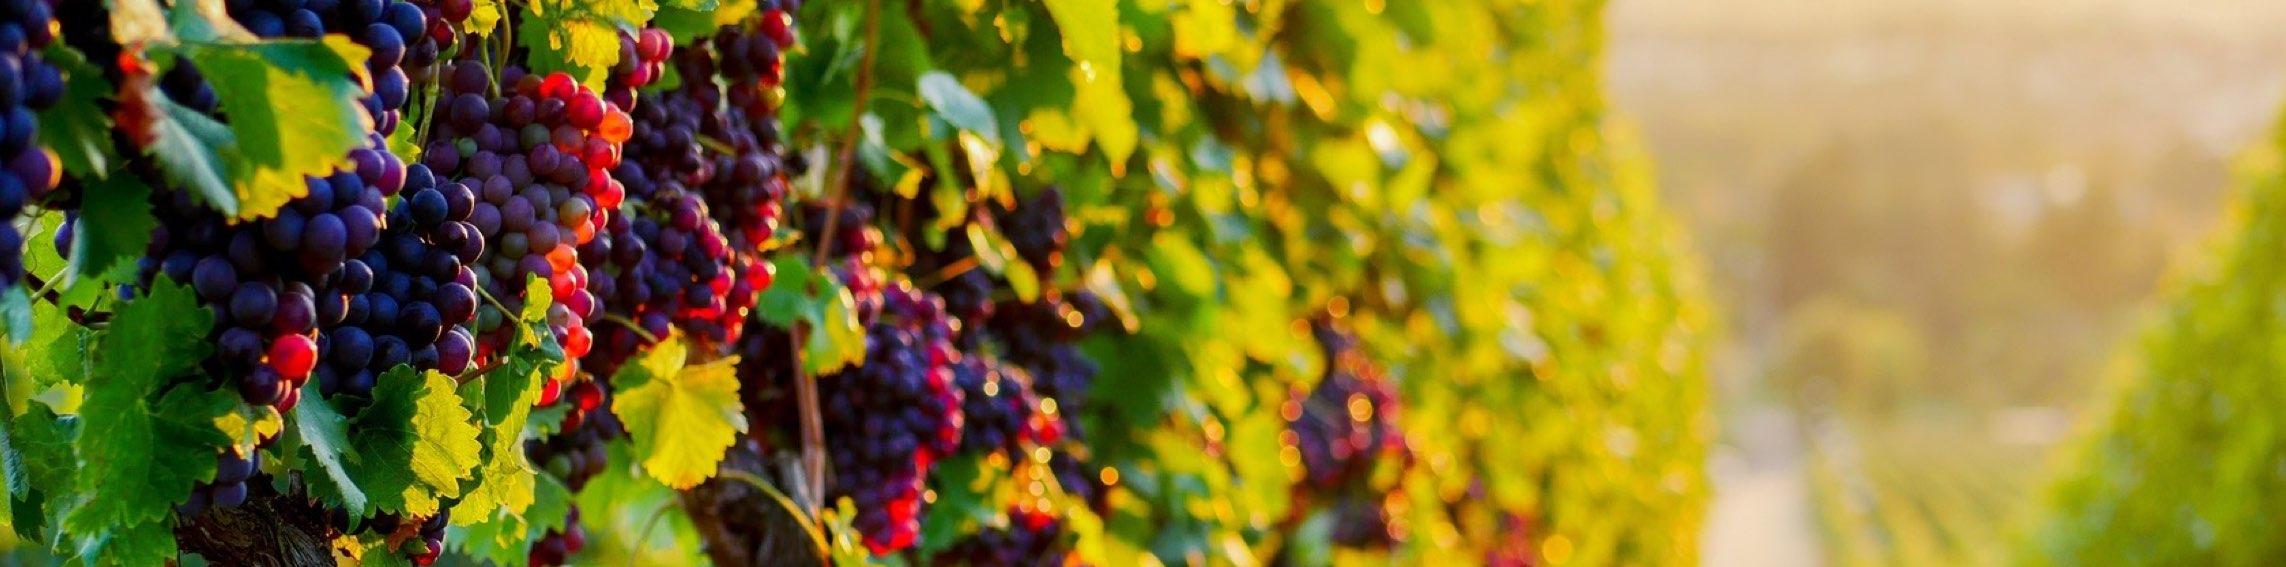 Vins.001